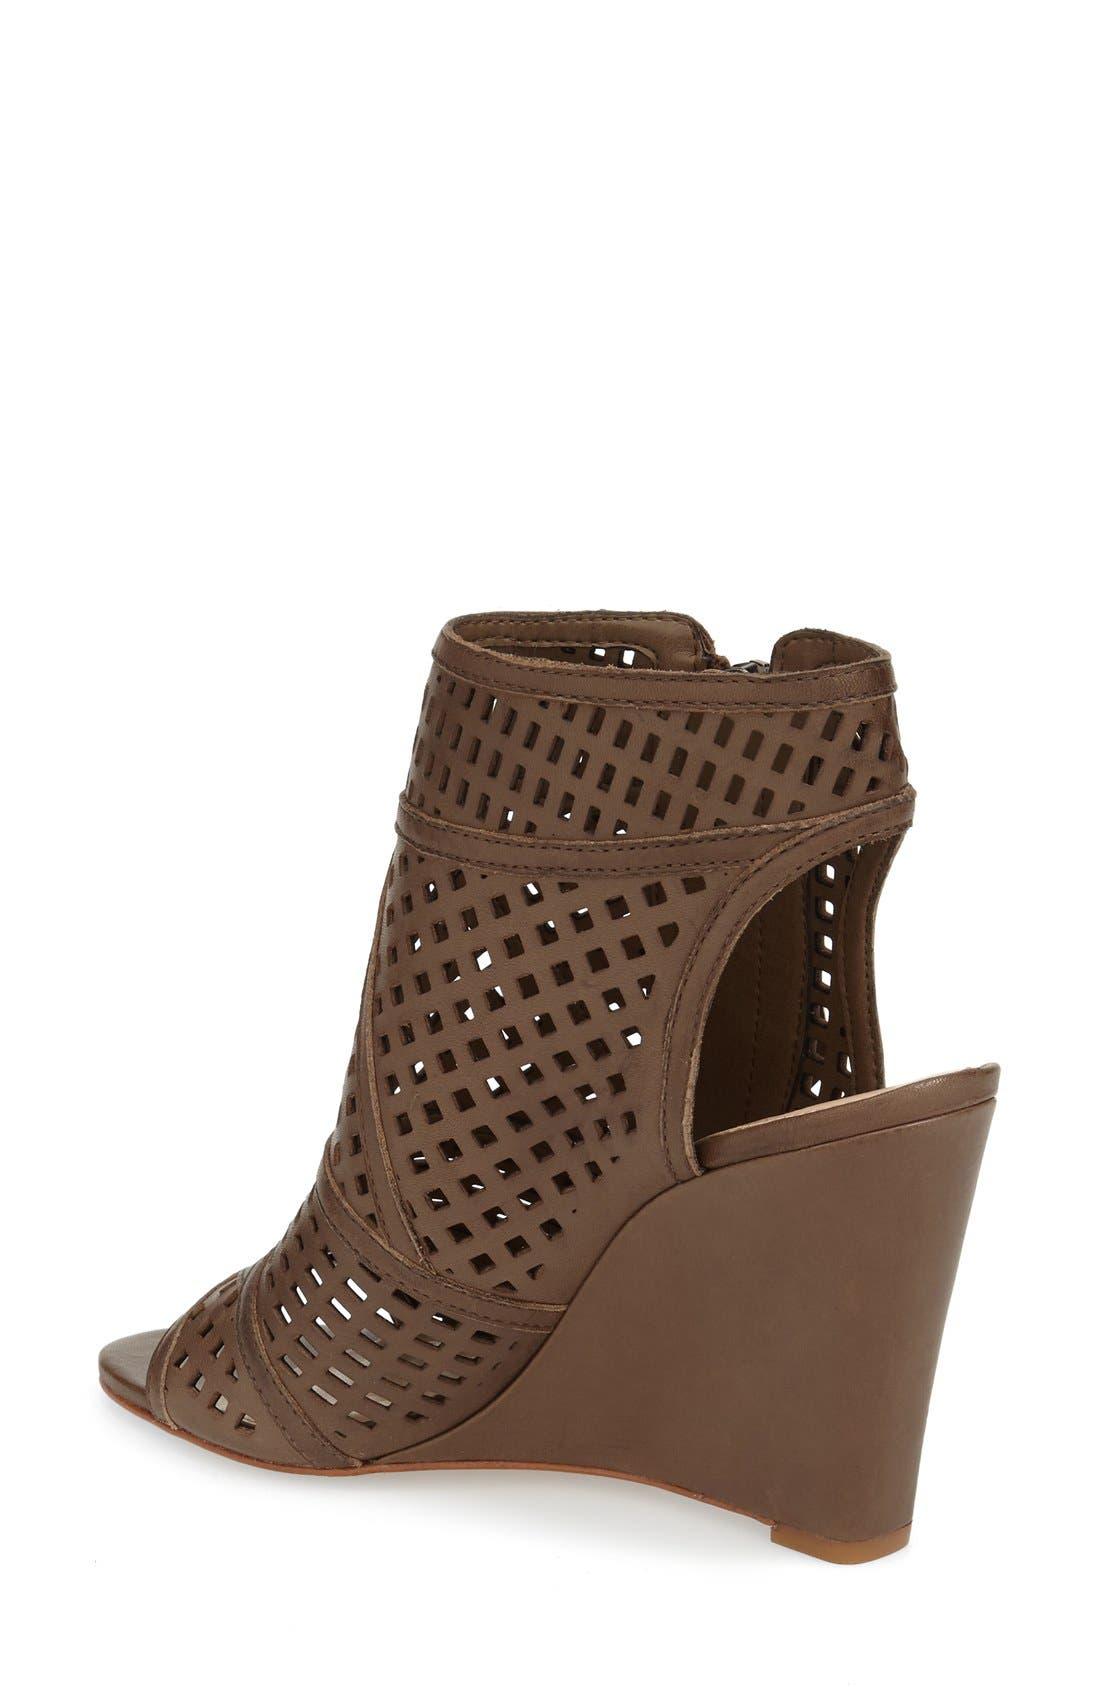 Alternate Image 2  - Vince Camuto 'Xabrina' Perforated Wedge Sandal (Women)